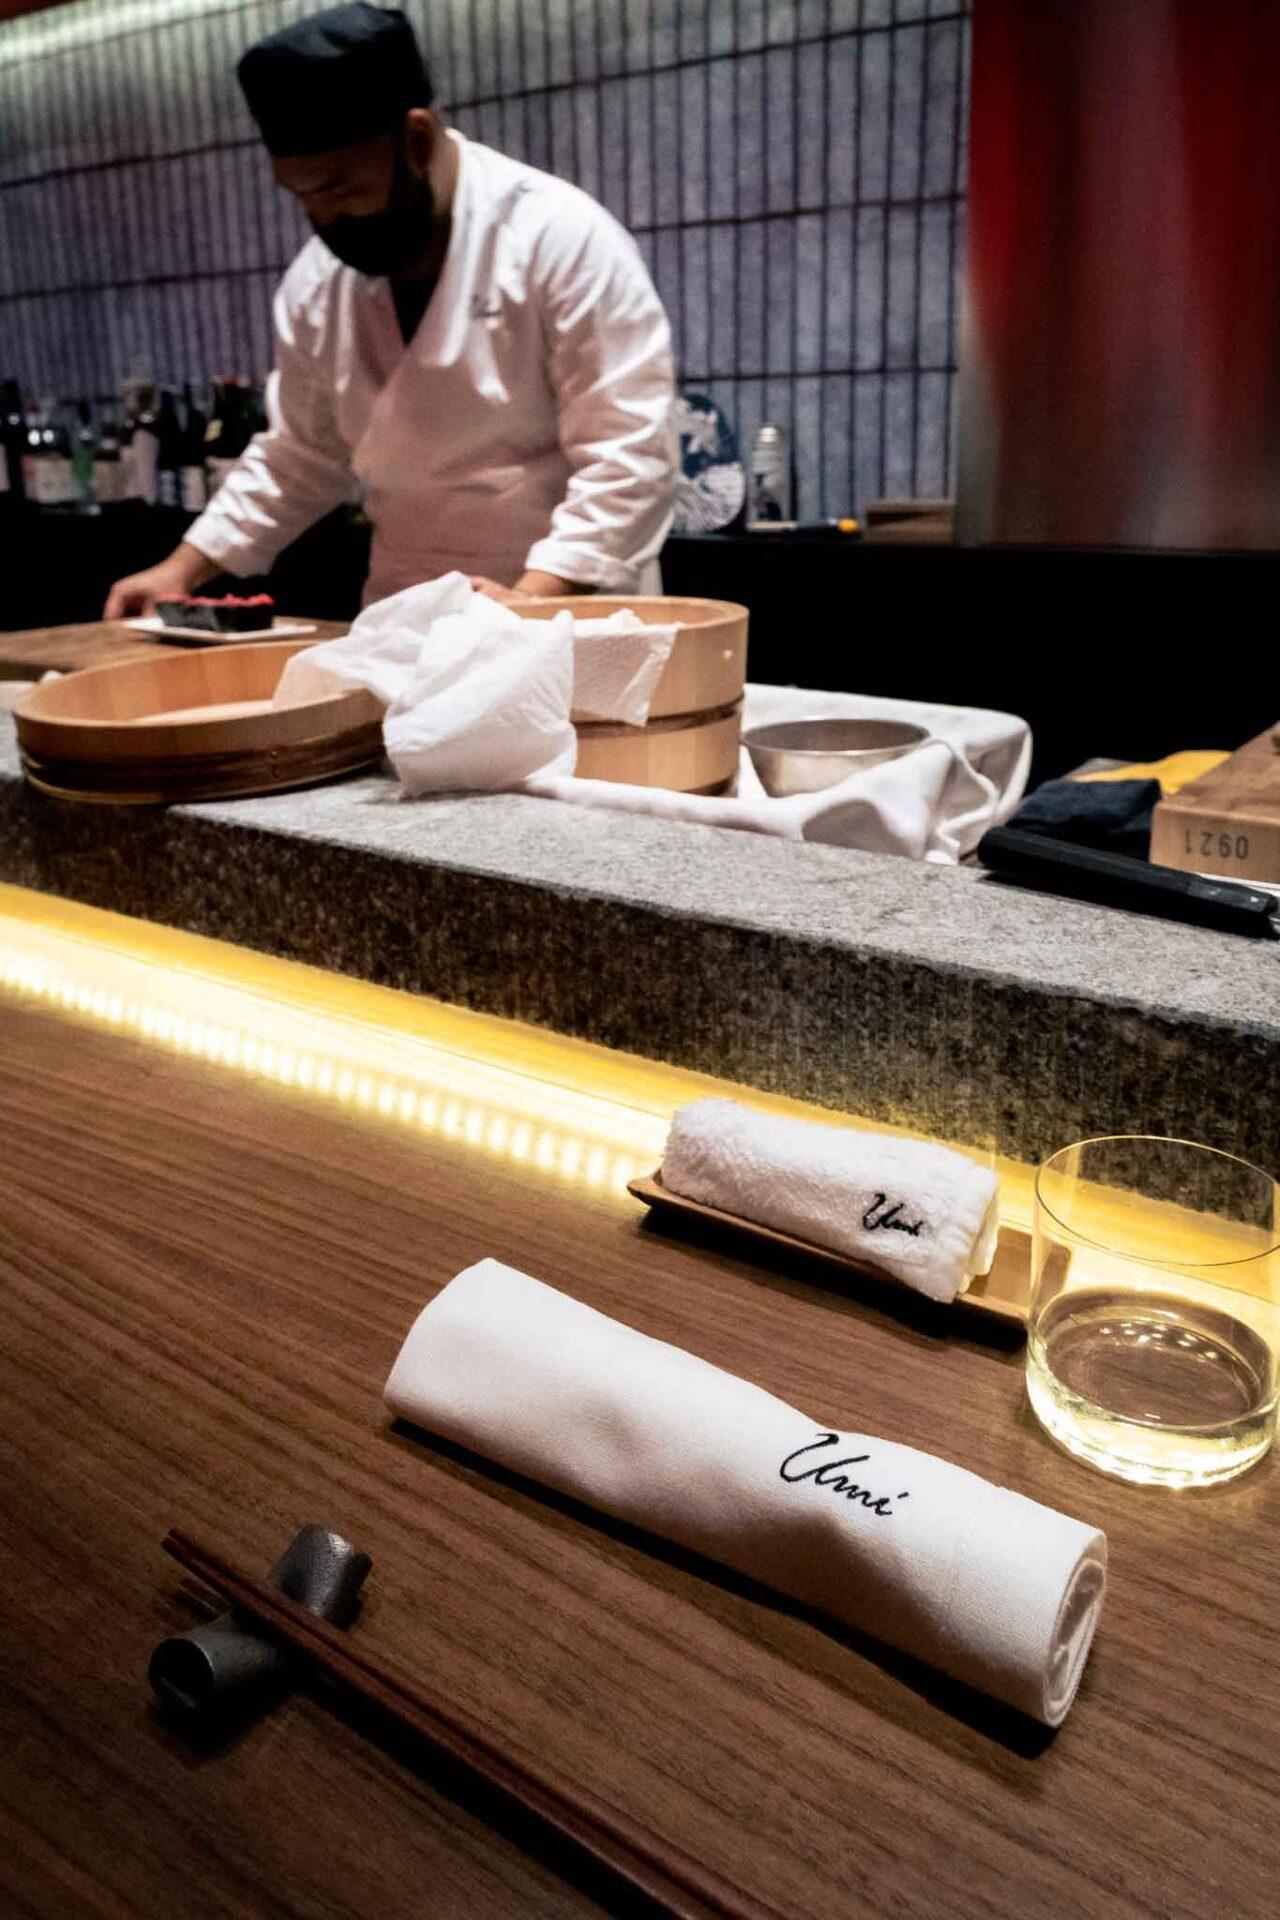 ristorante giapponese Umi Salerno bancone